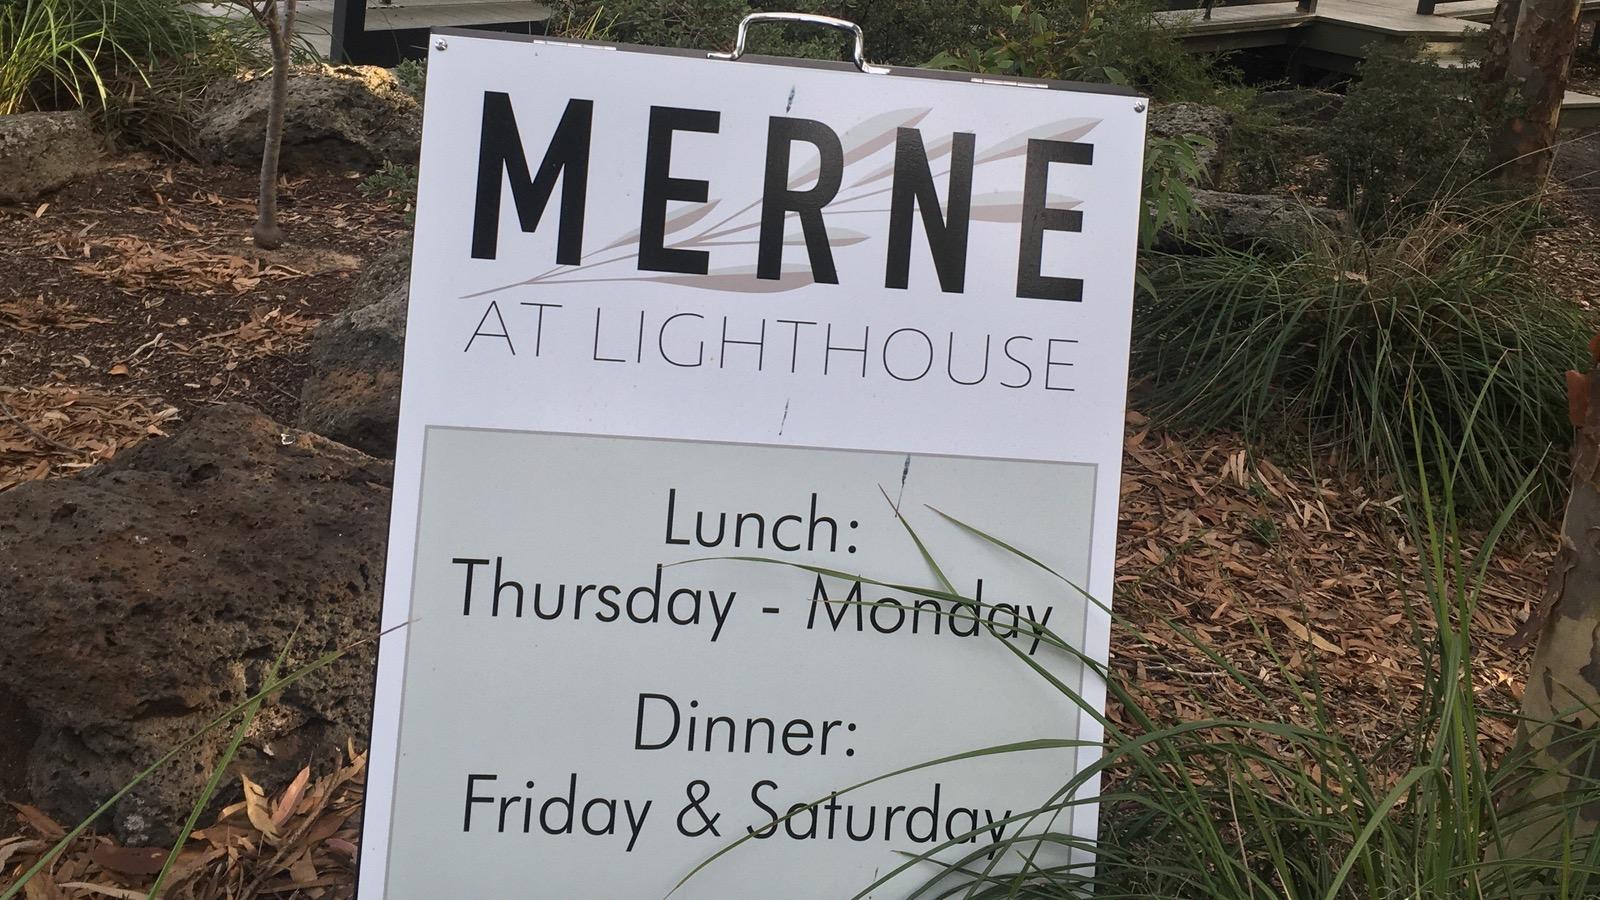 Merne at Lighthouse